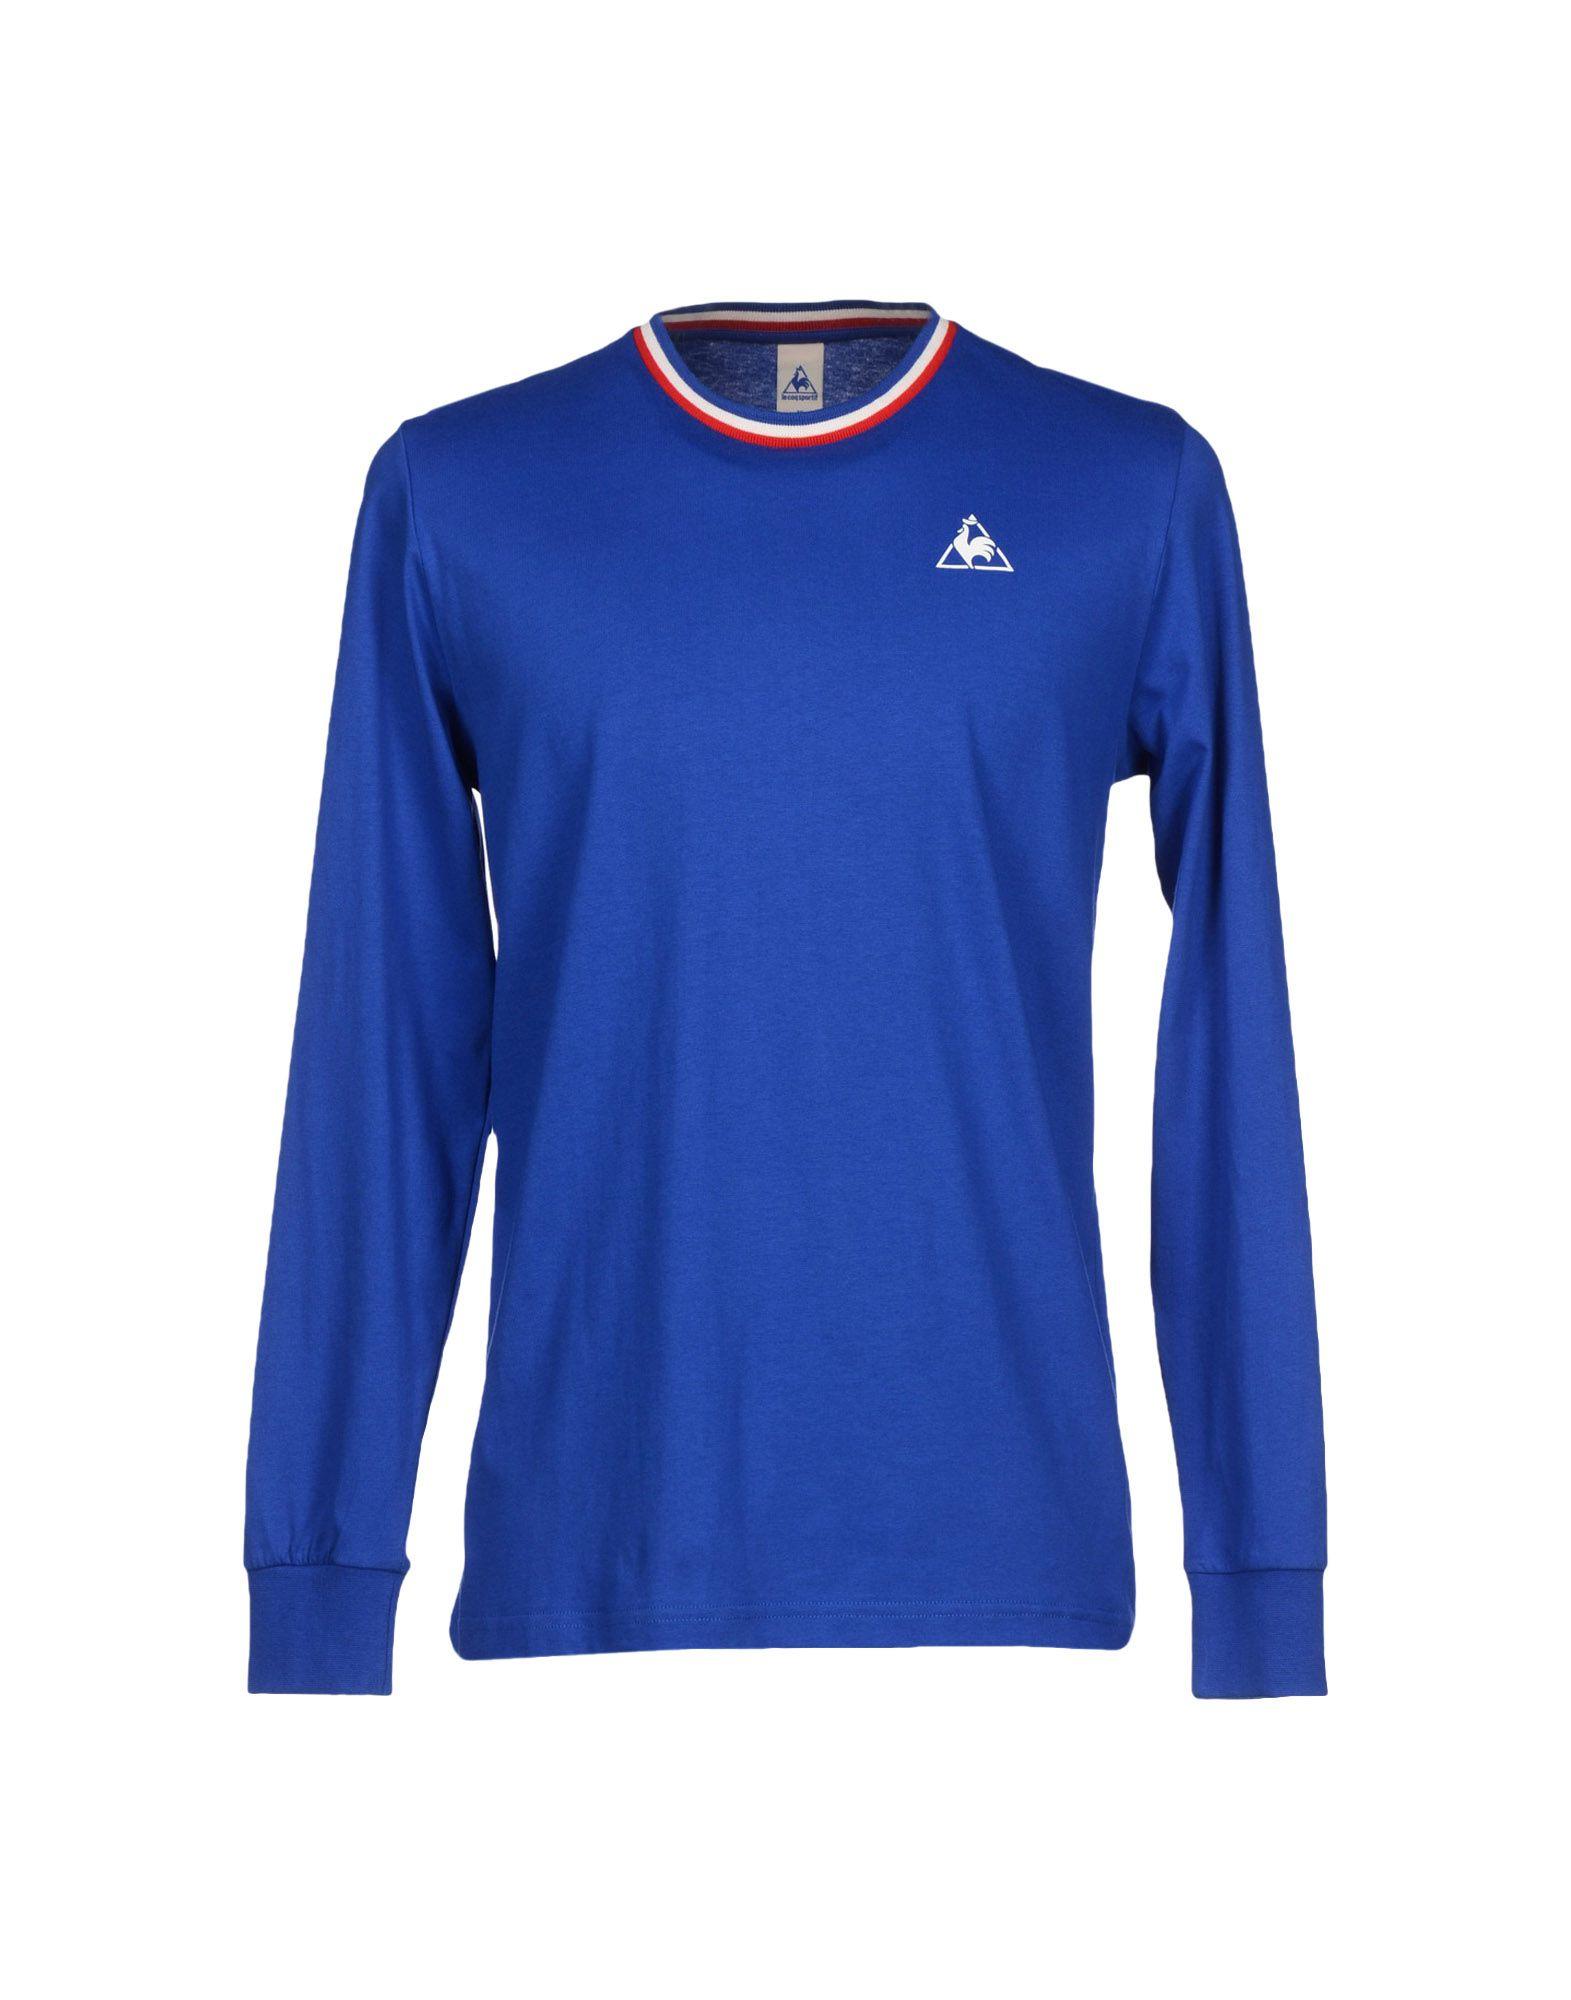 le coq sportif shirt - photo #18